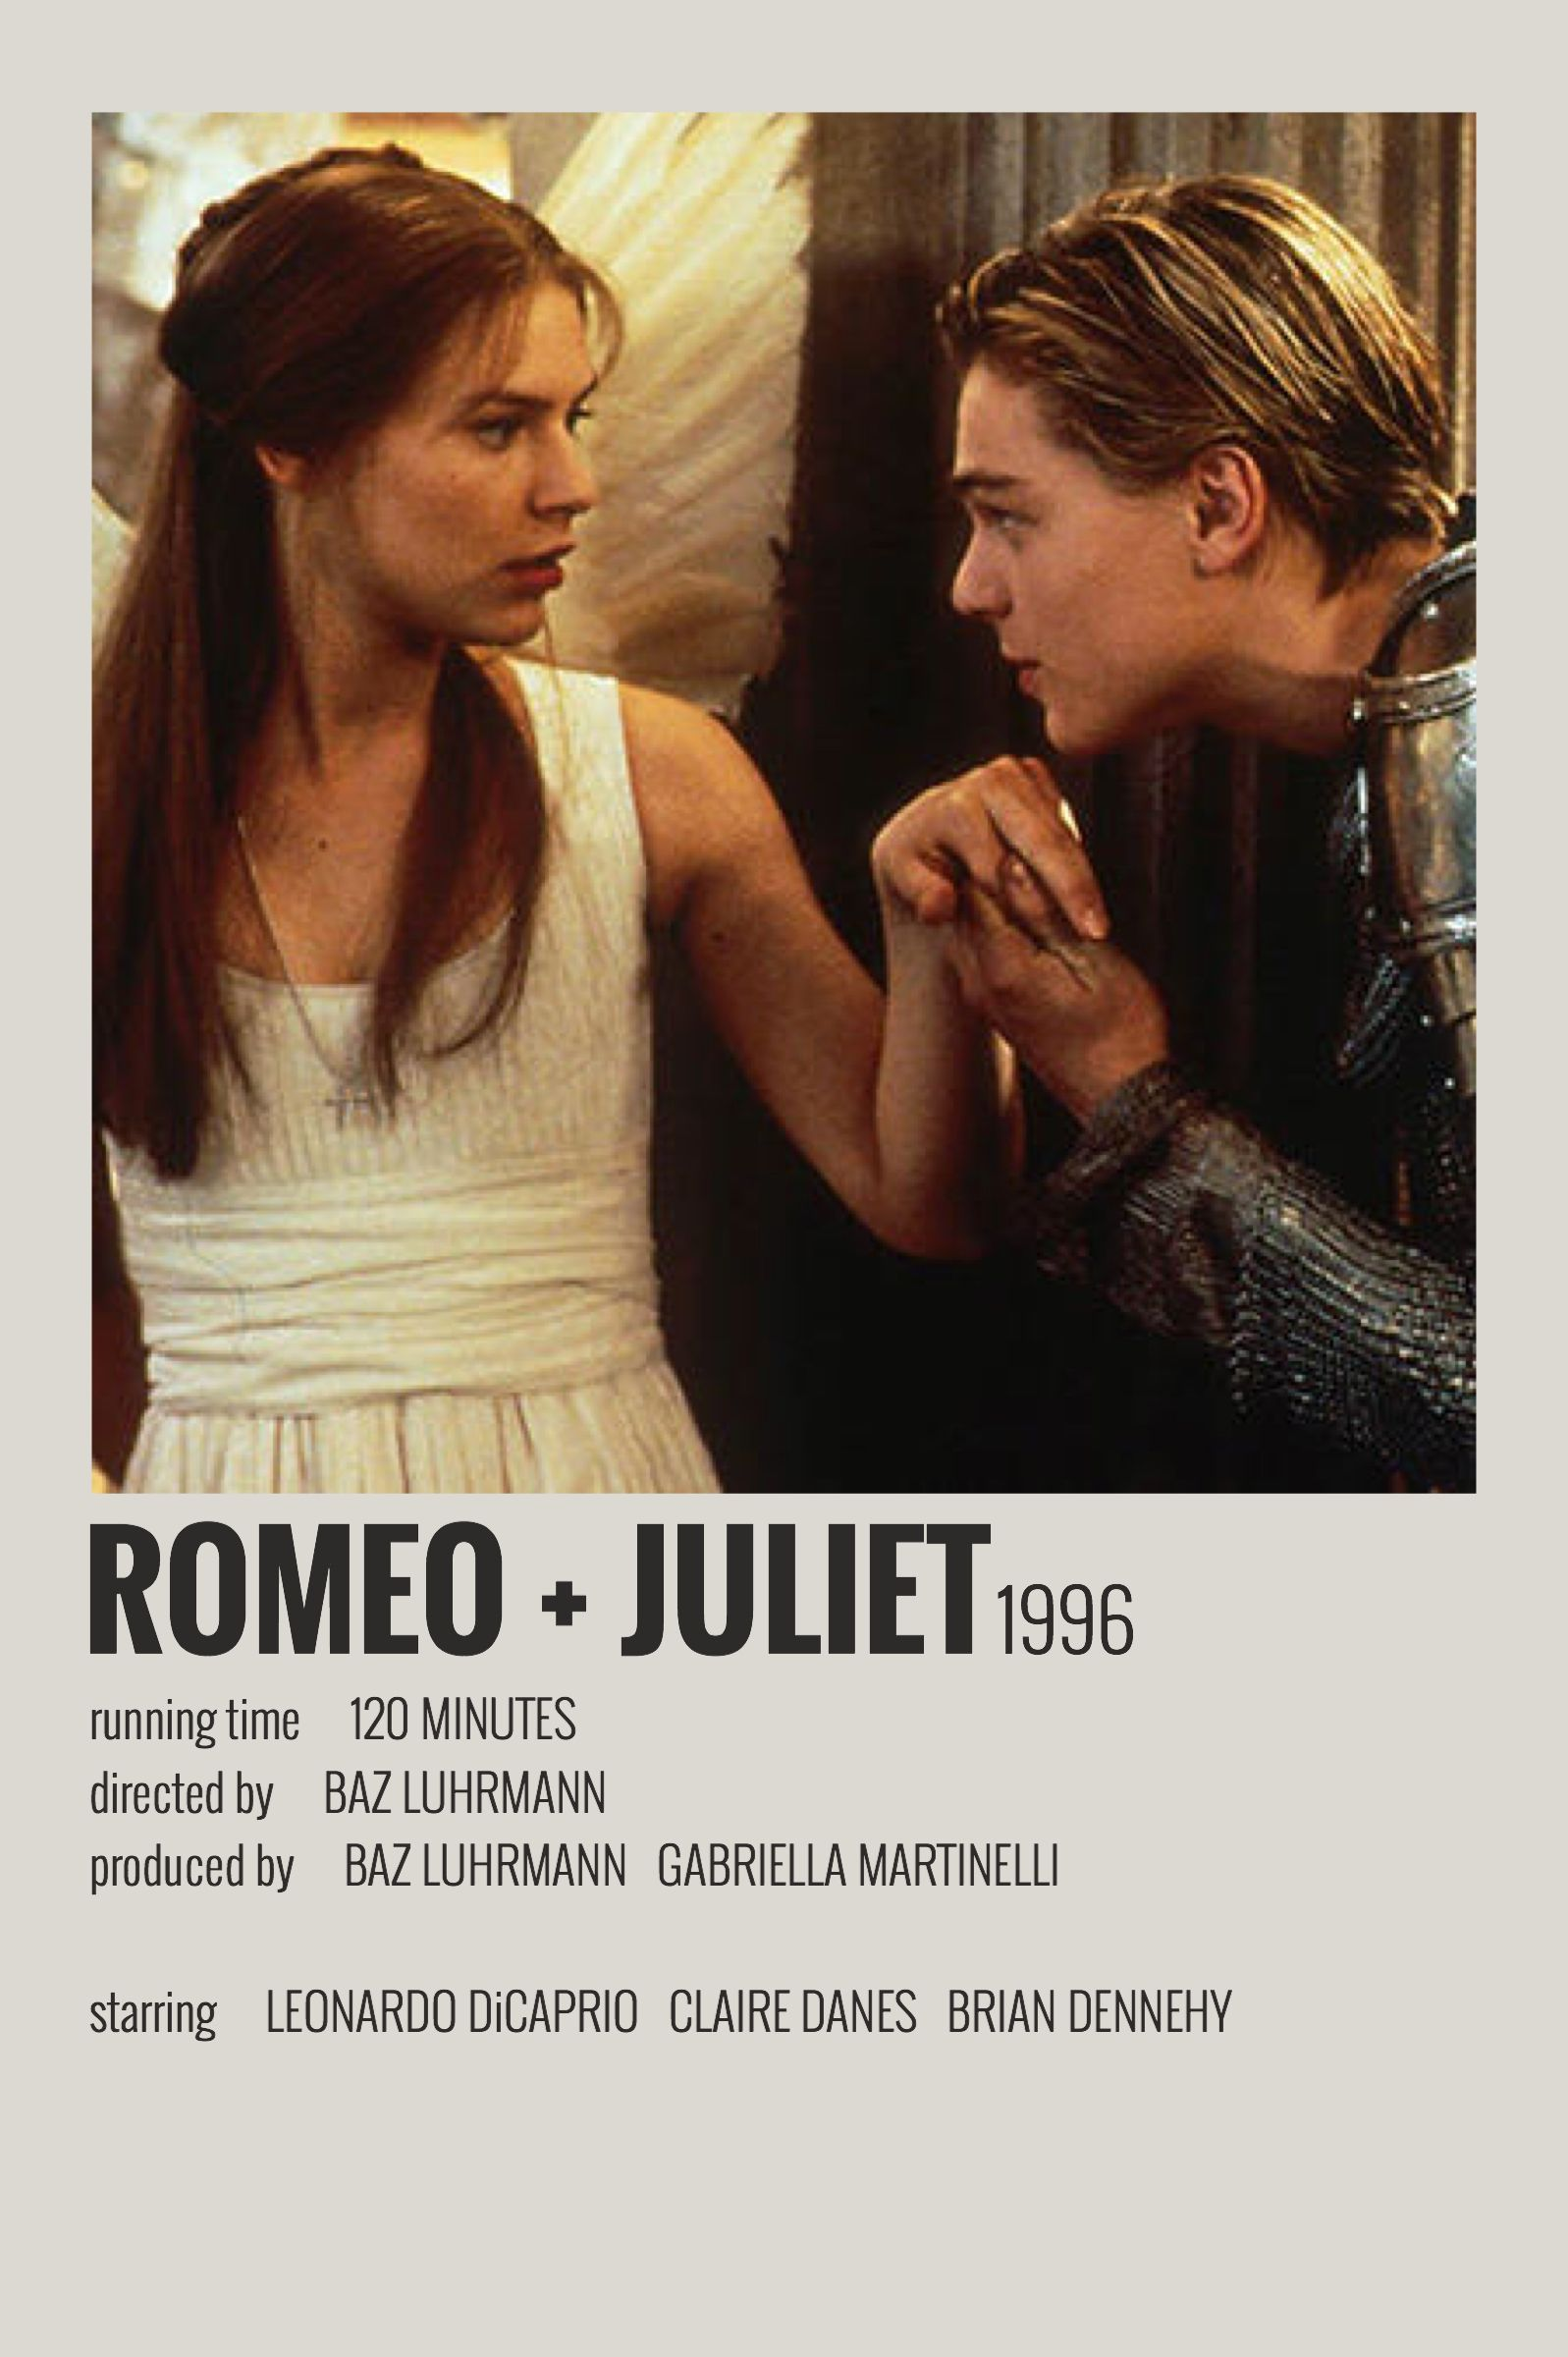 Alternative Minimalist Movie/Show Polaroid Poster - Romeo + Juliet